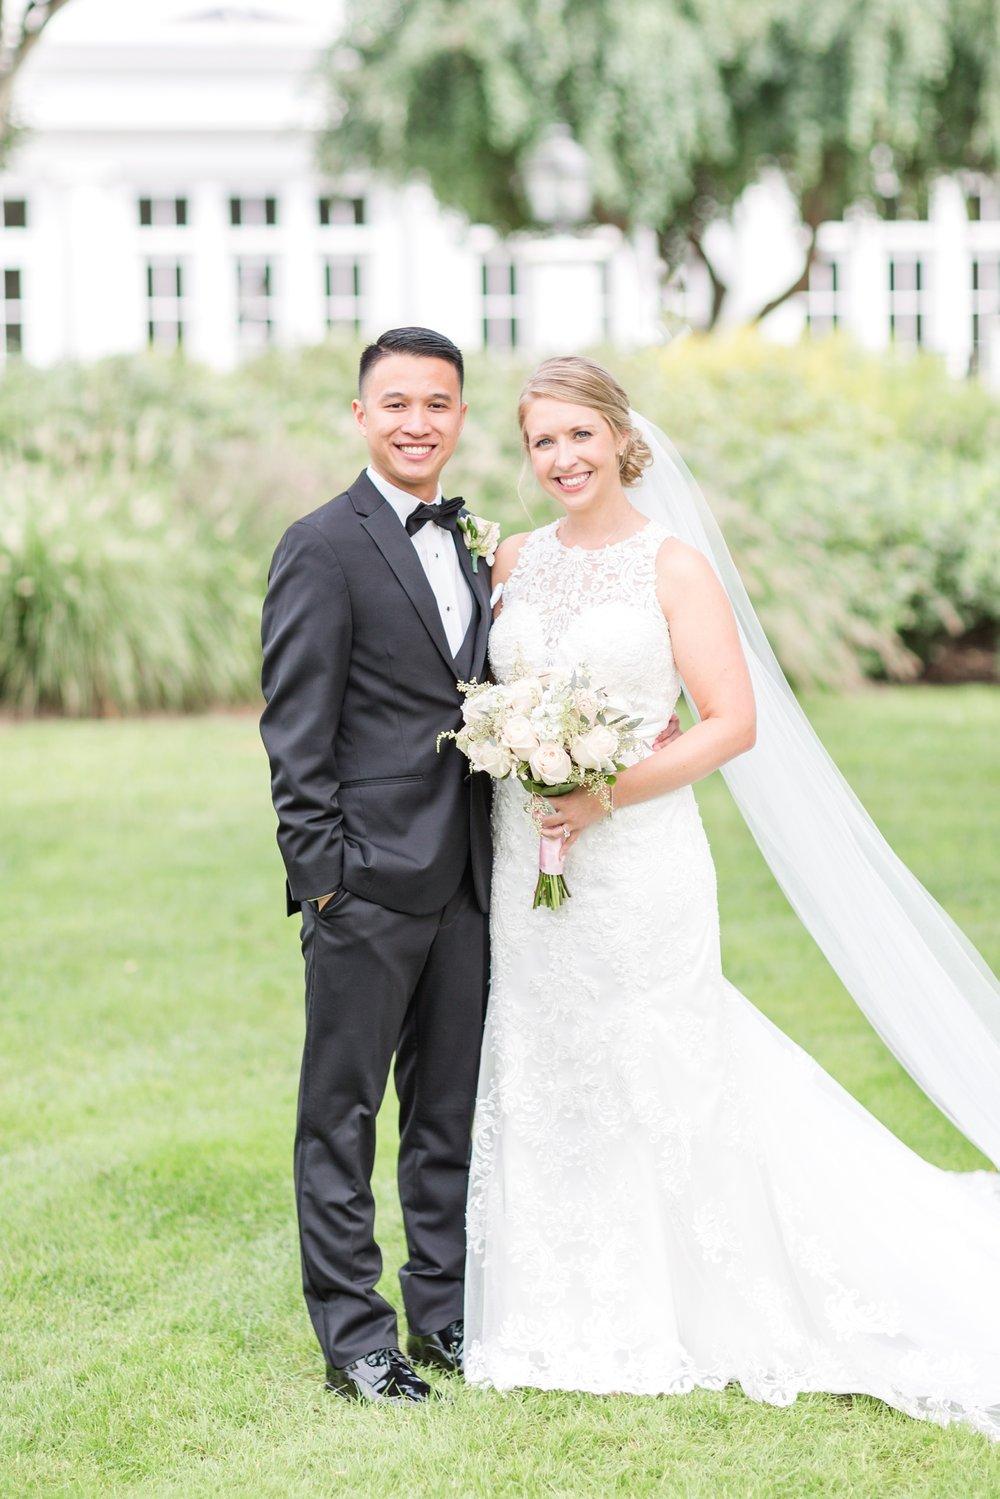 WONG WEDDING HIGHLIGHTS-180_Deerfield-Country-Club-Wedding-Delaware-Maryland-wedding-photographer-anna-grace-photography-photo.jpg